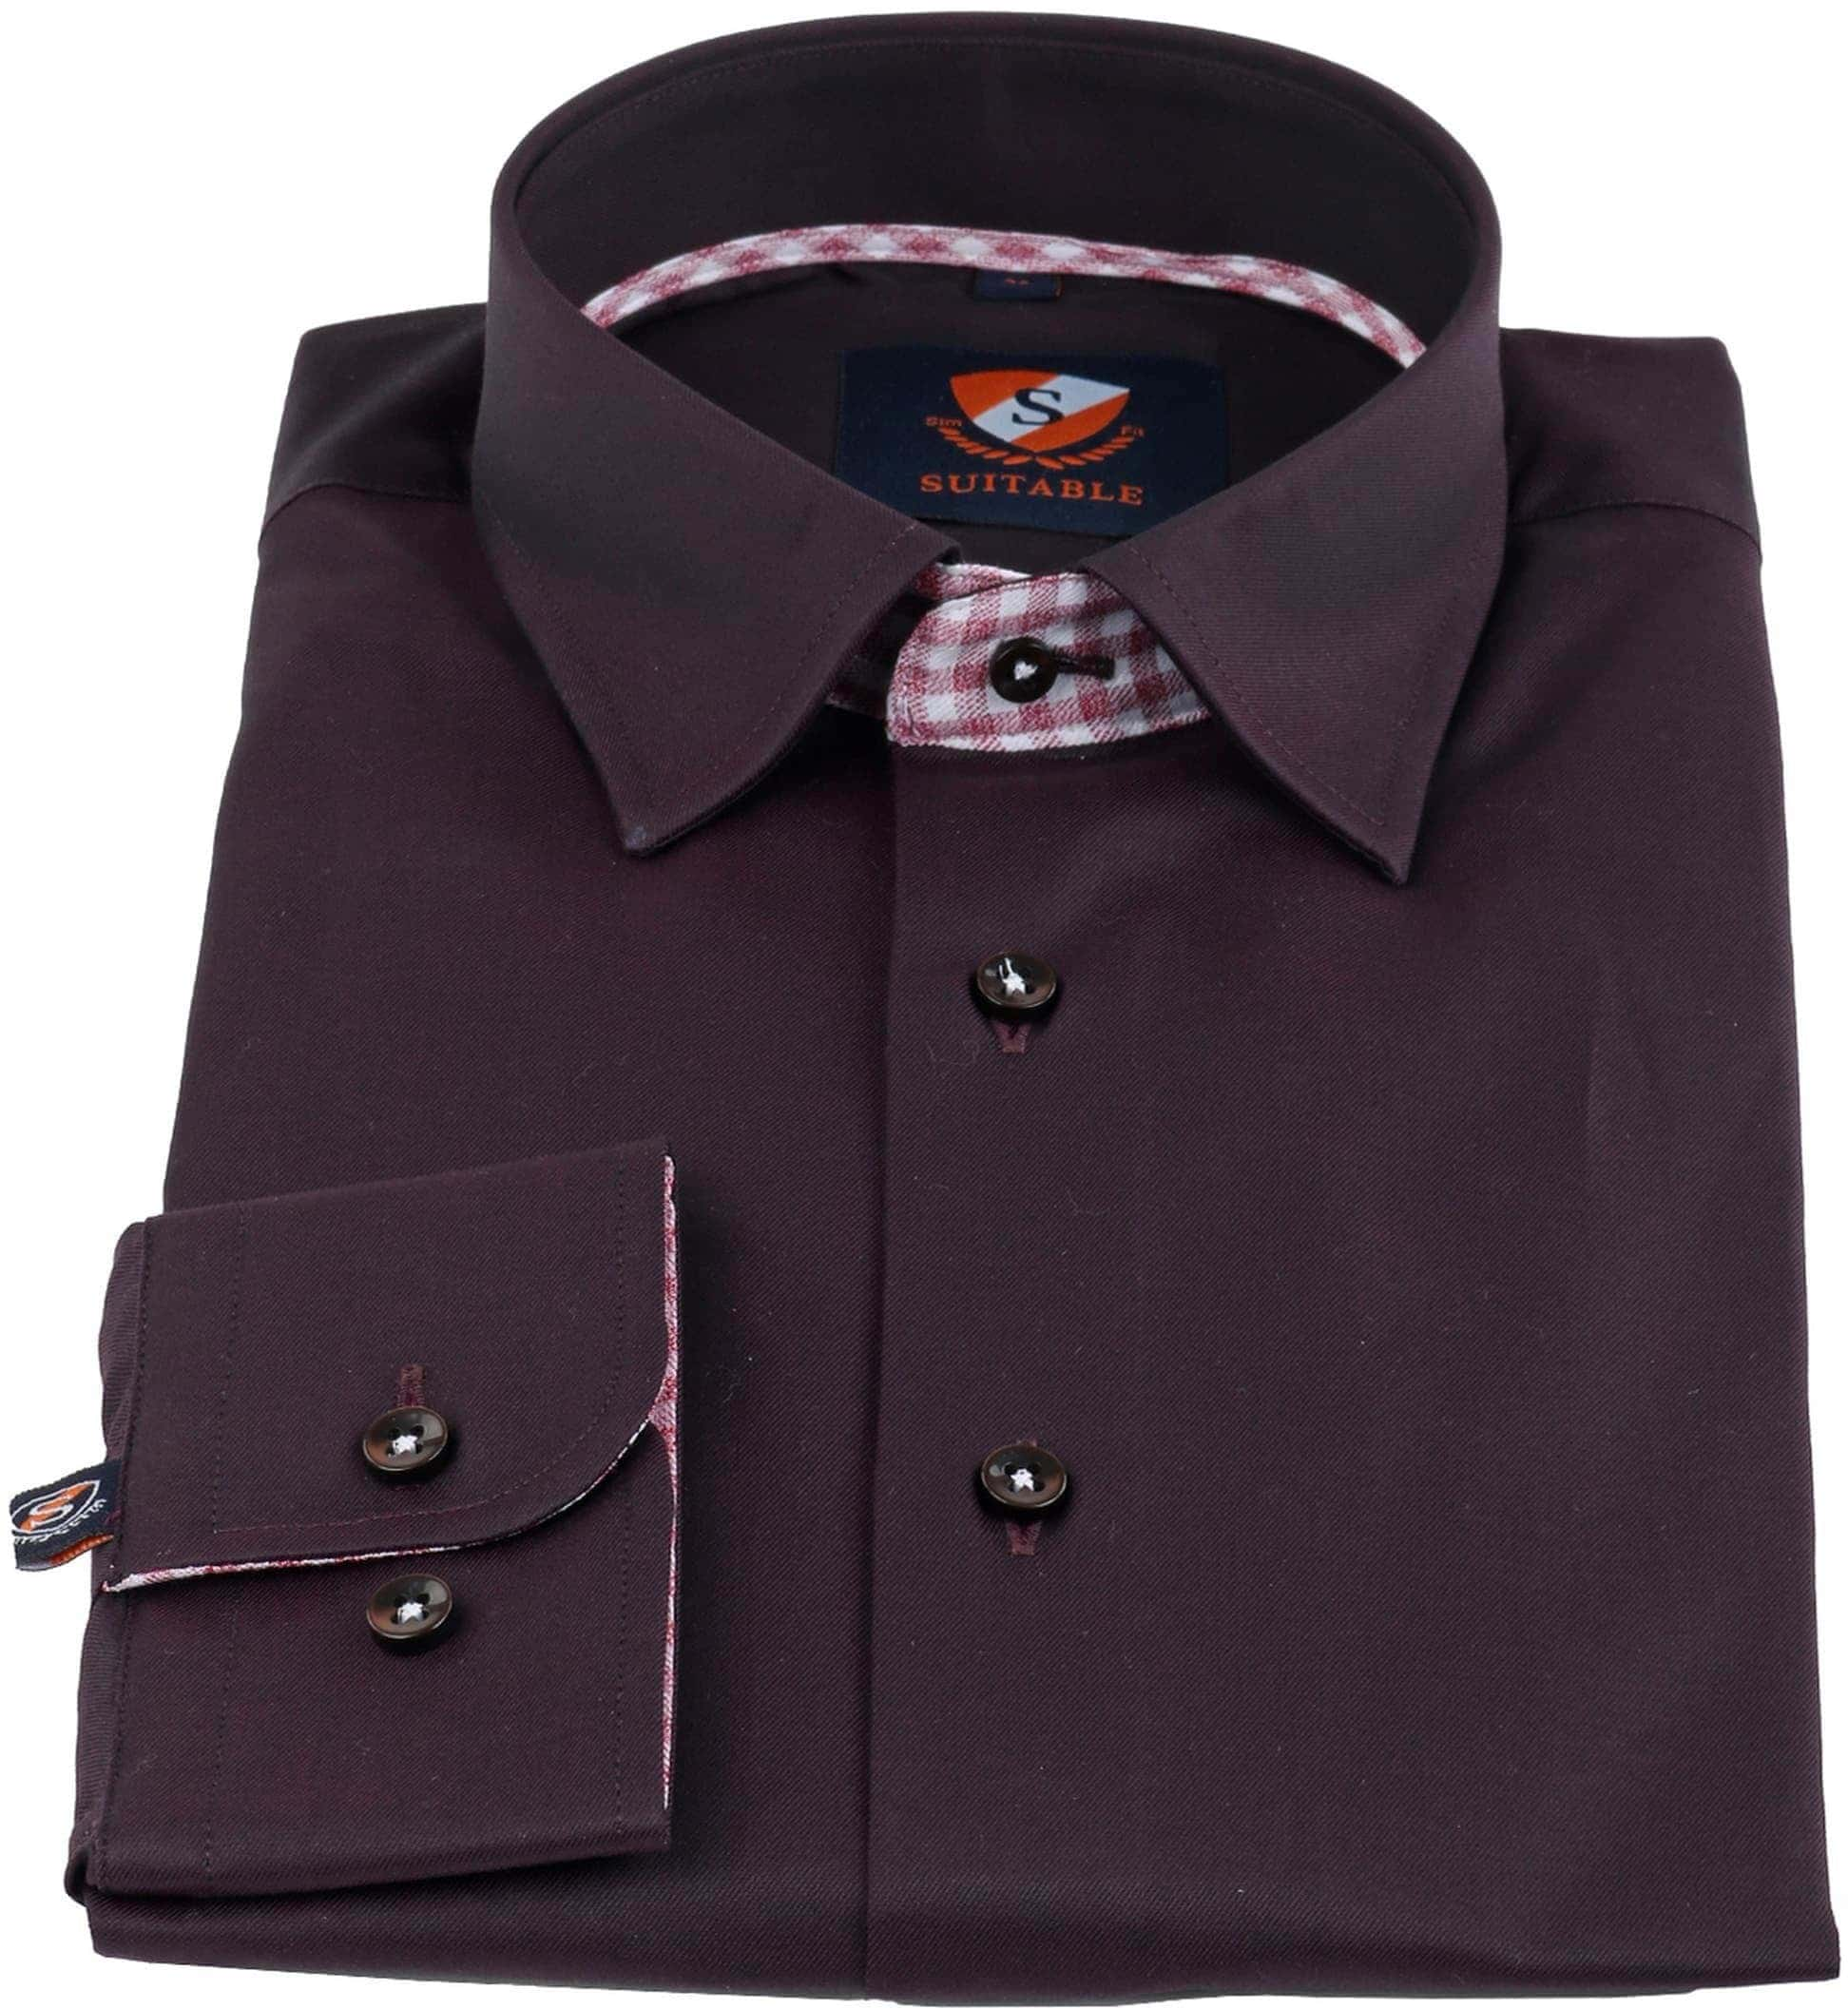 Suitable Overhemd Bruin foto 2